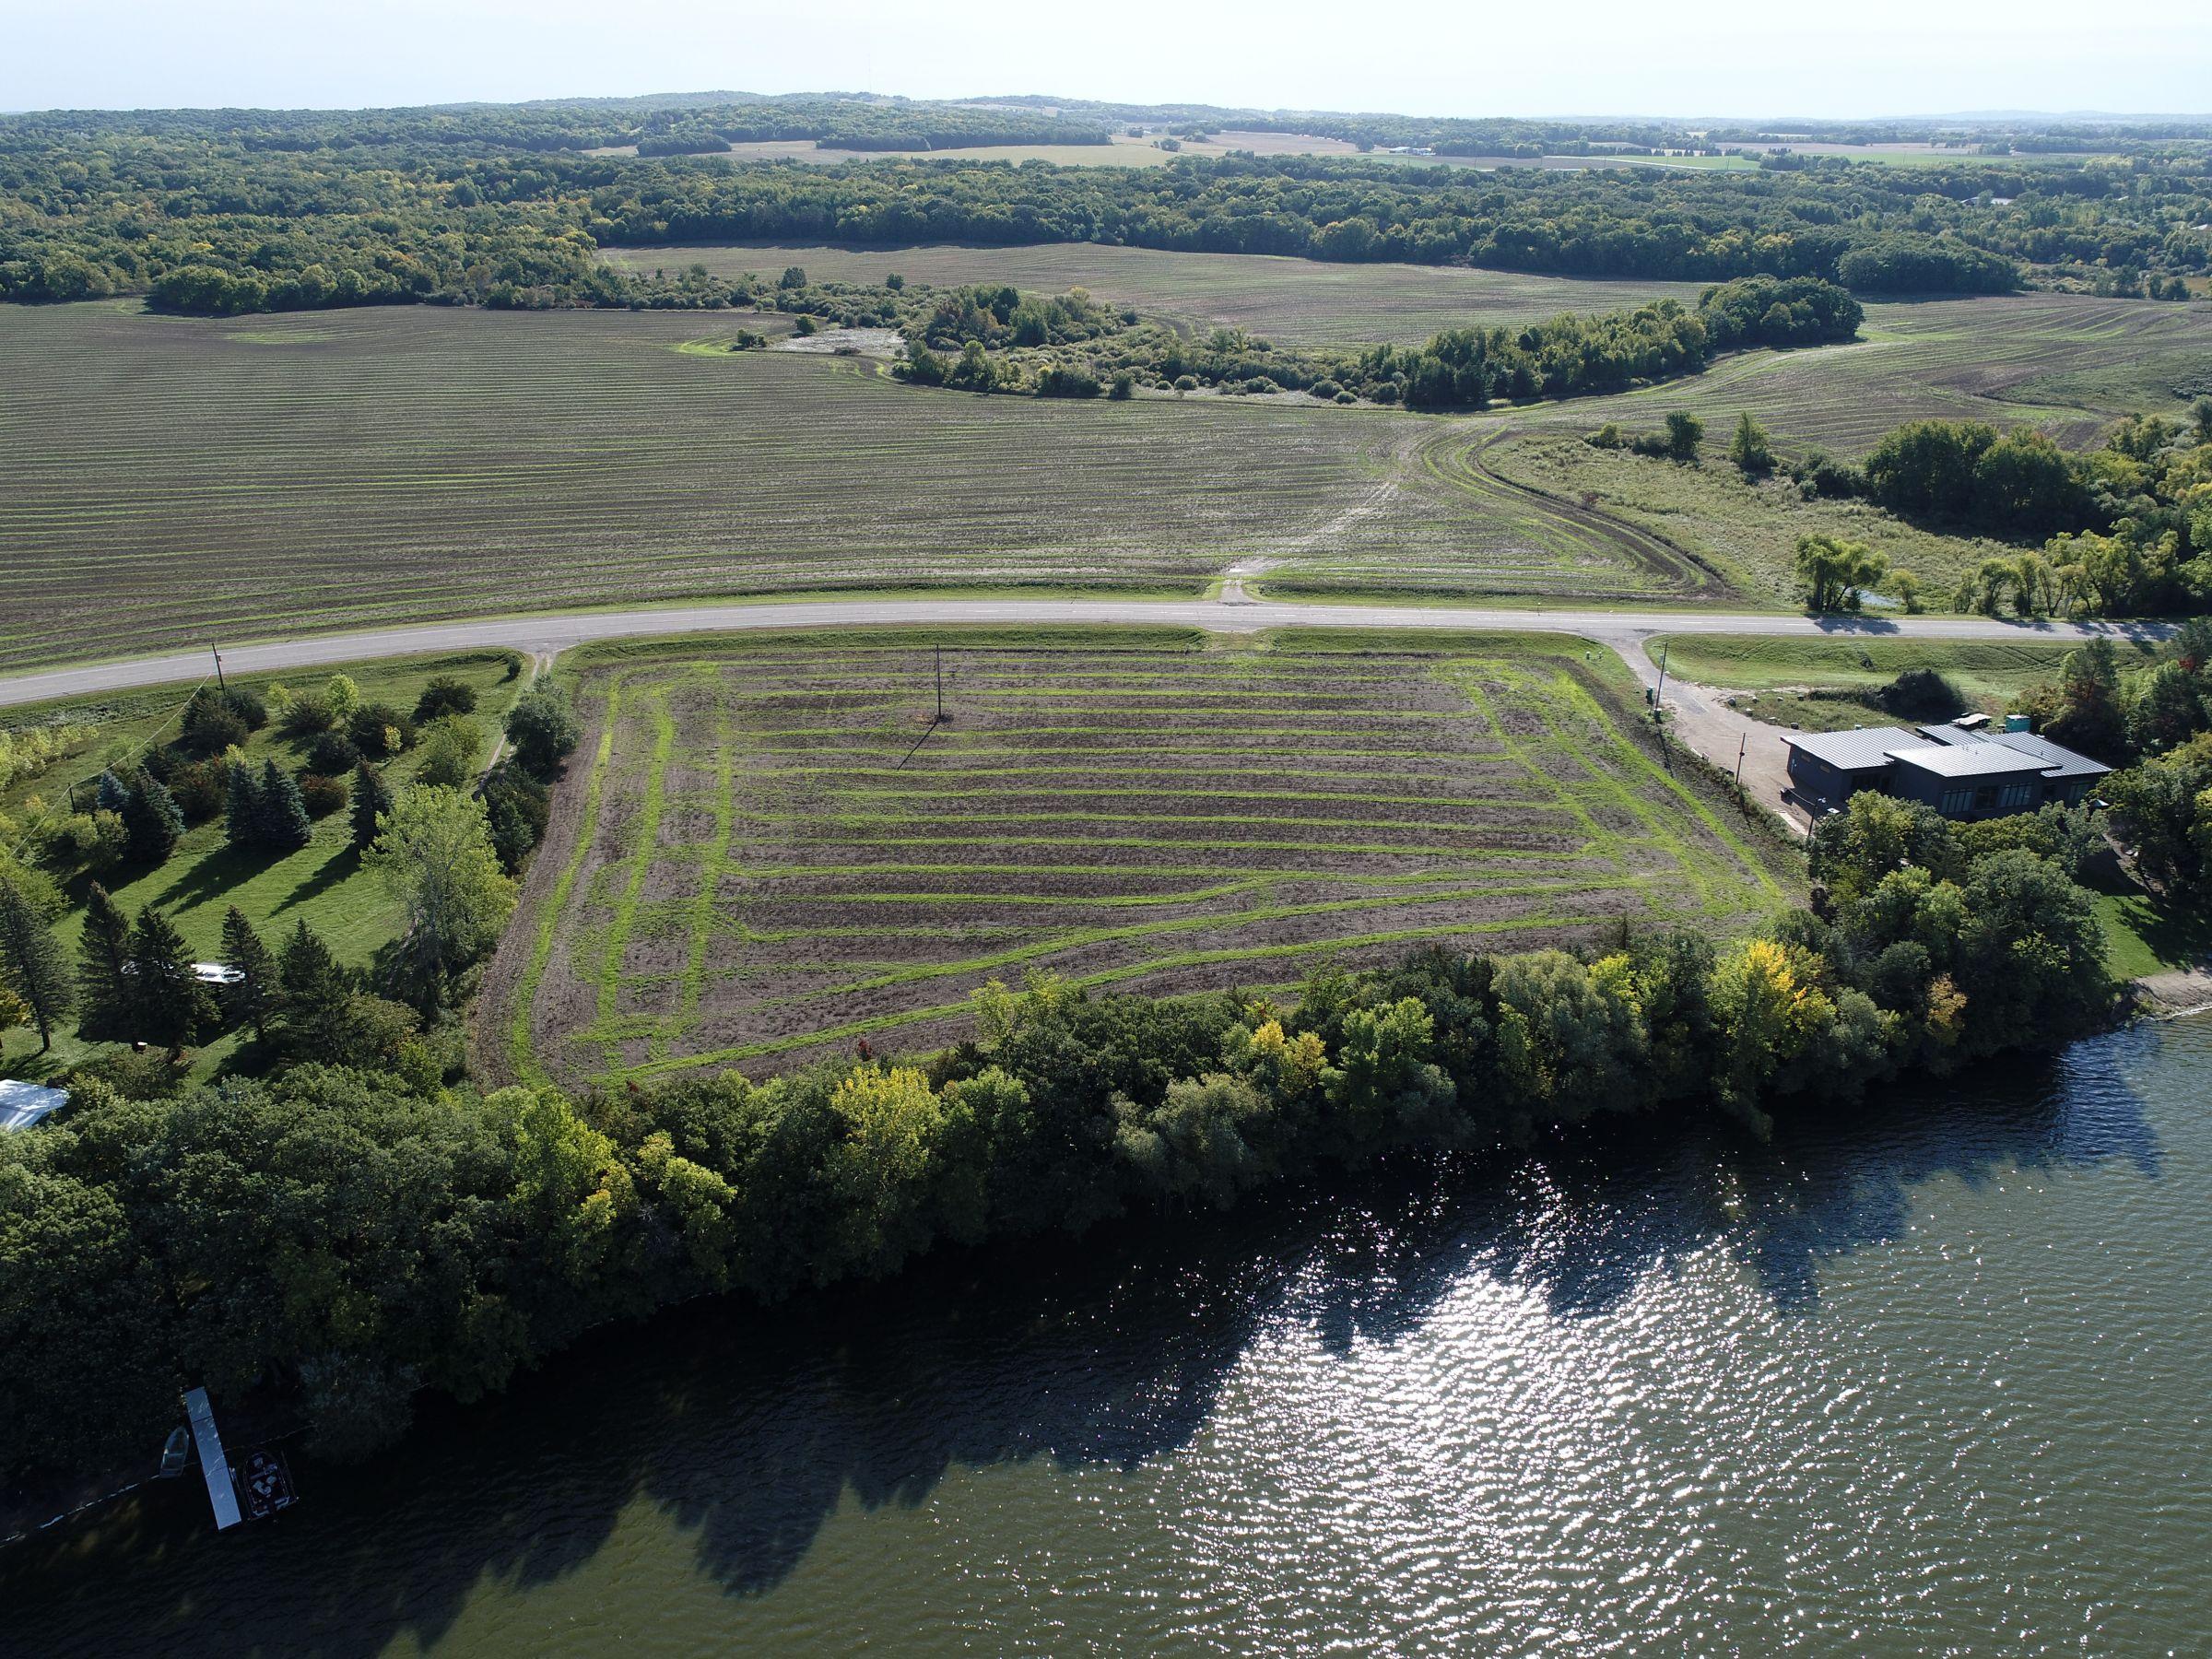 land-stearns-county-minnesota-298-acres-listing-number-15712-1-2021-09-23-123754.JPG